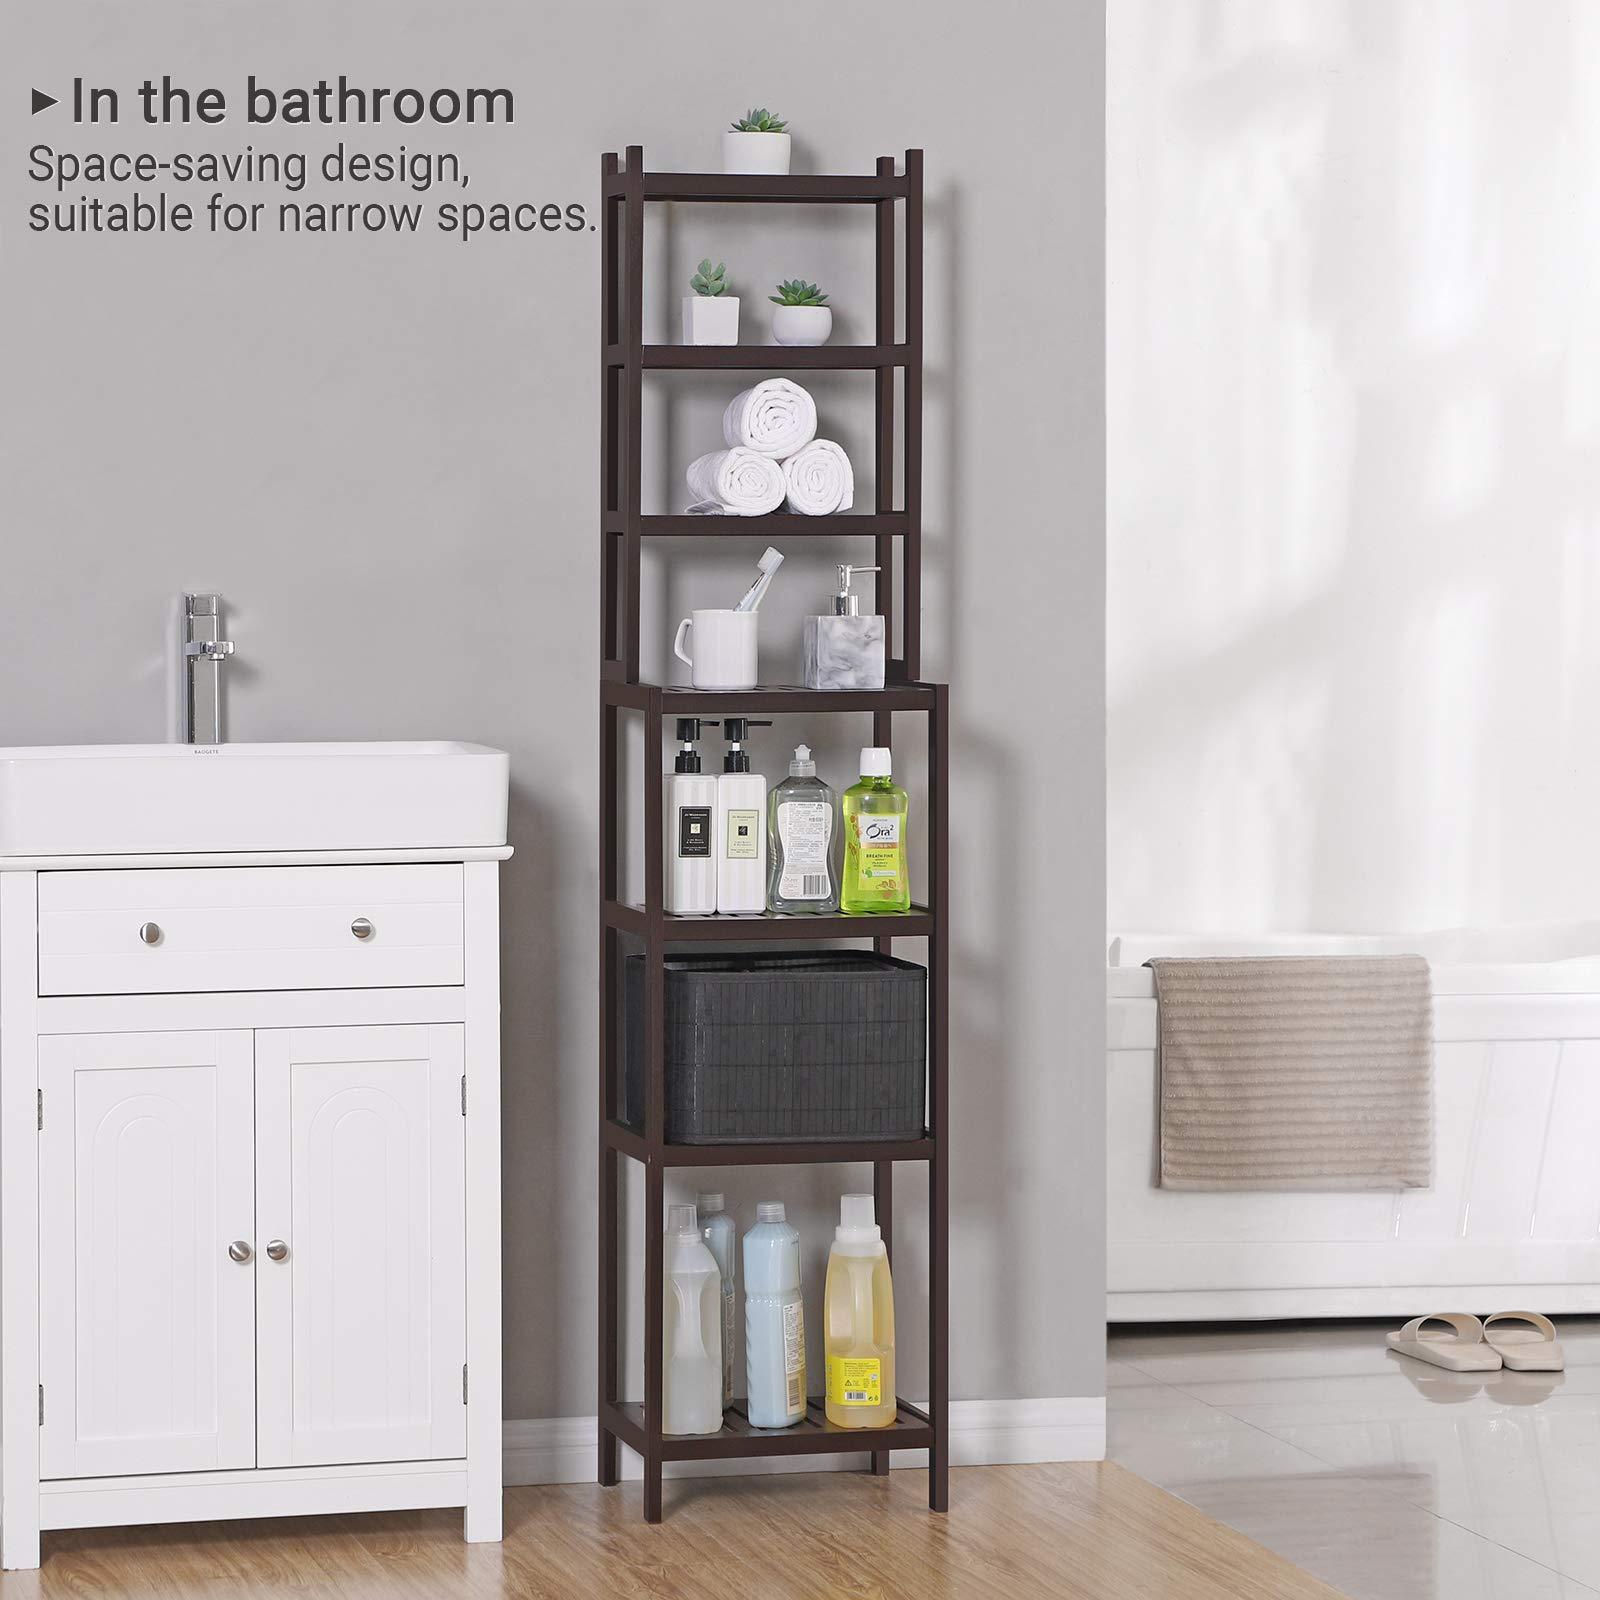 SONGMICS 7-Tier Bamboo Bathroom Shelf, 2-in-1 Design Adjustable Storage Rack, Free Standing Multifunctional Organizer, Shelving Unit for Washroom, Living Room, Kitchen, Brown UBCR01BR by SONGMICS (Image #3)